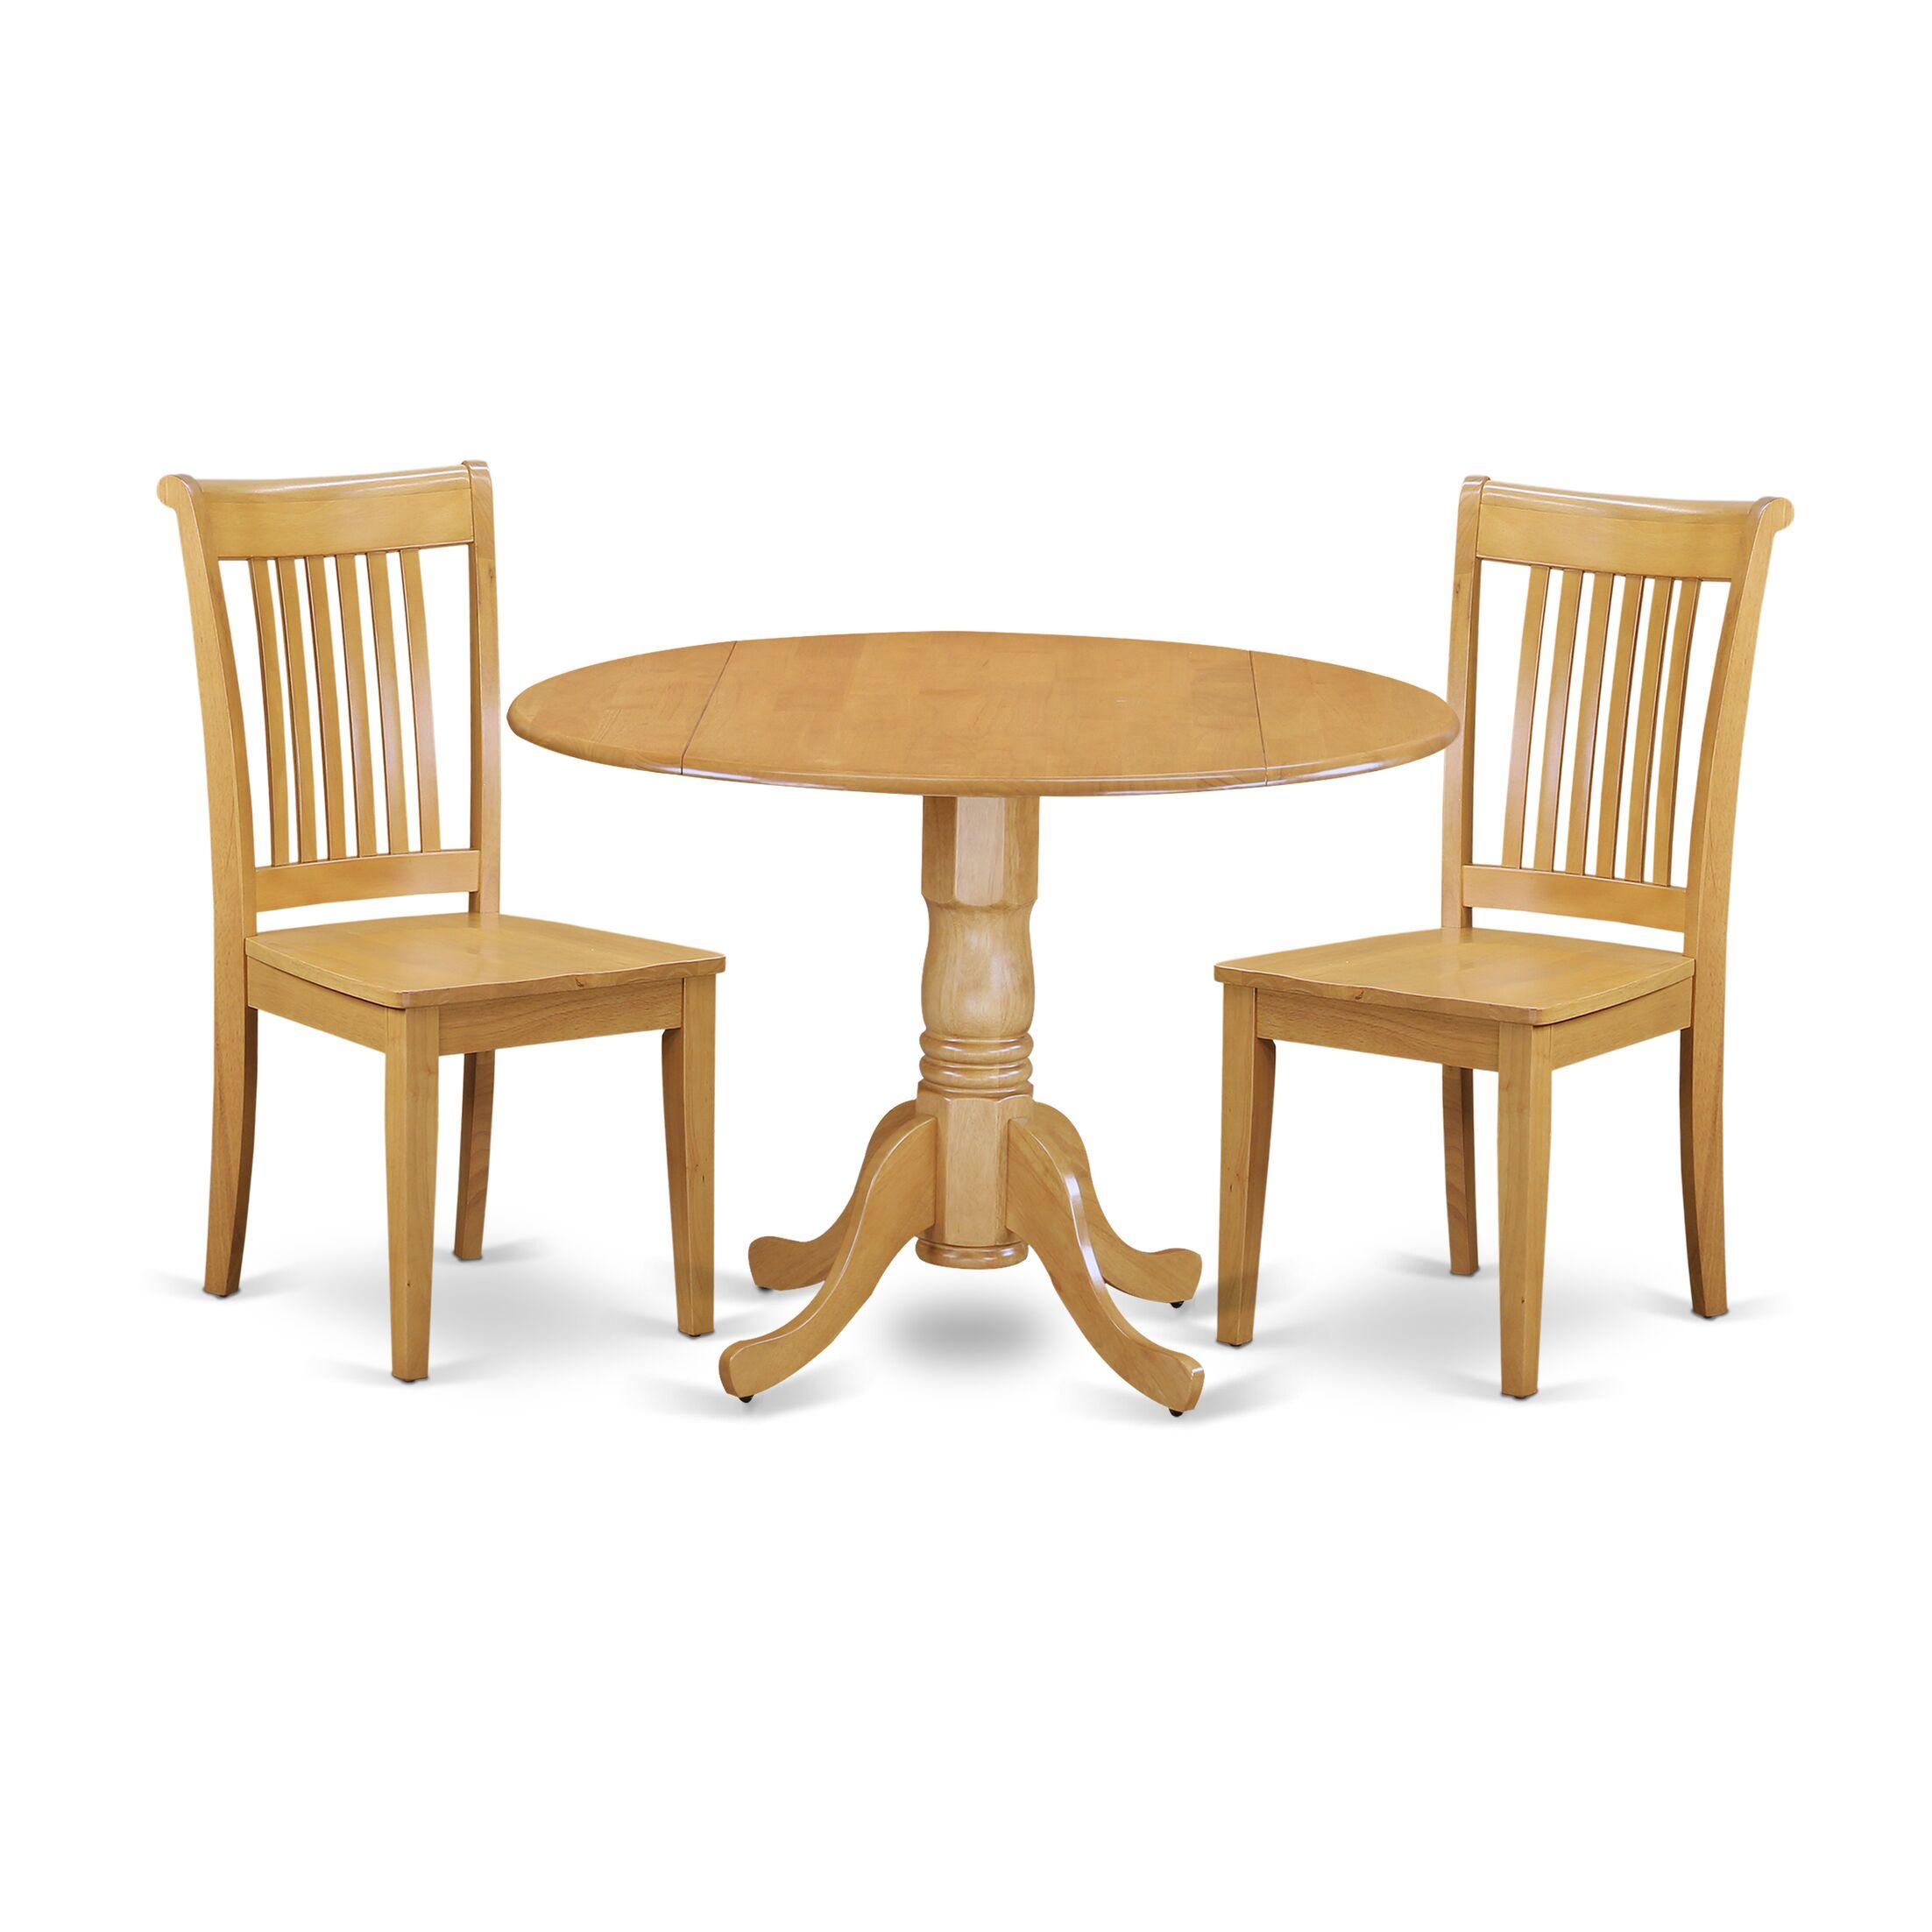 Dining Table Sets Gloucester 3 Piece Drop Leaf Breakfast Nook Solid Wood Set